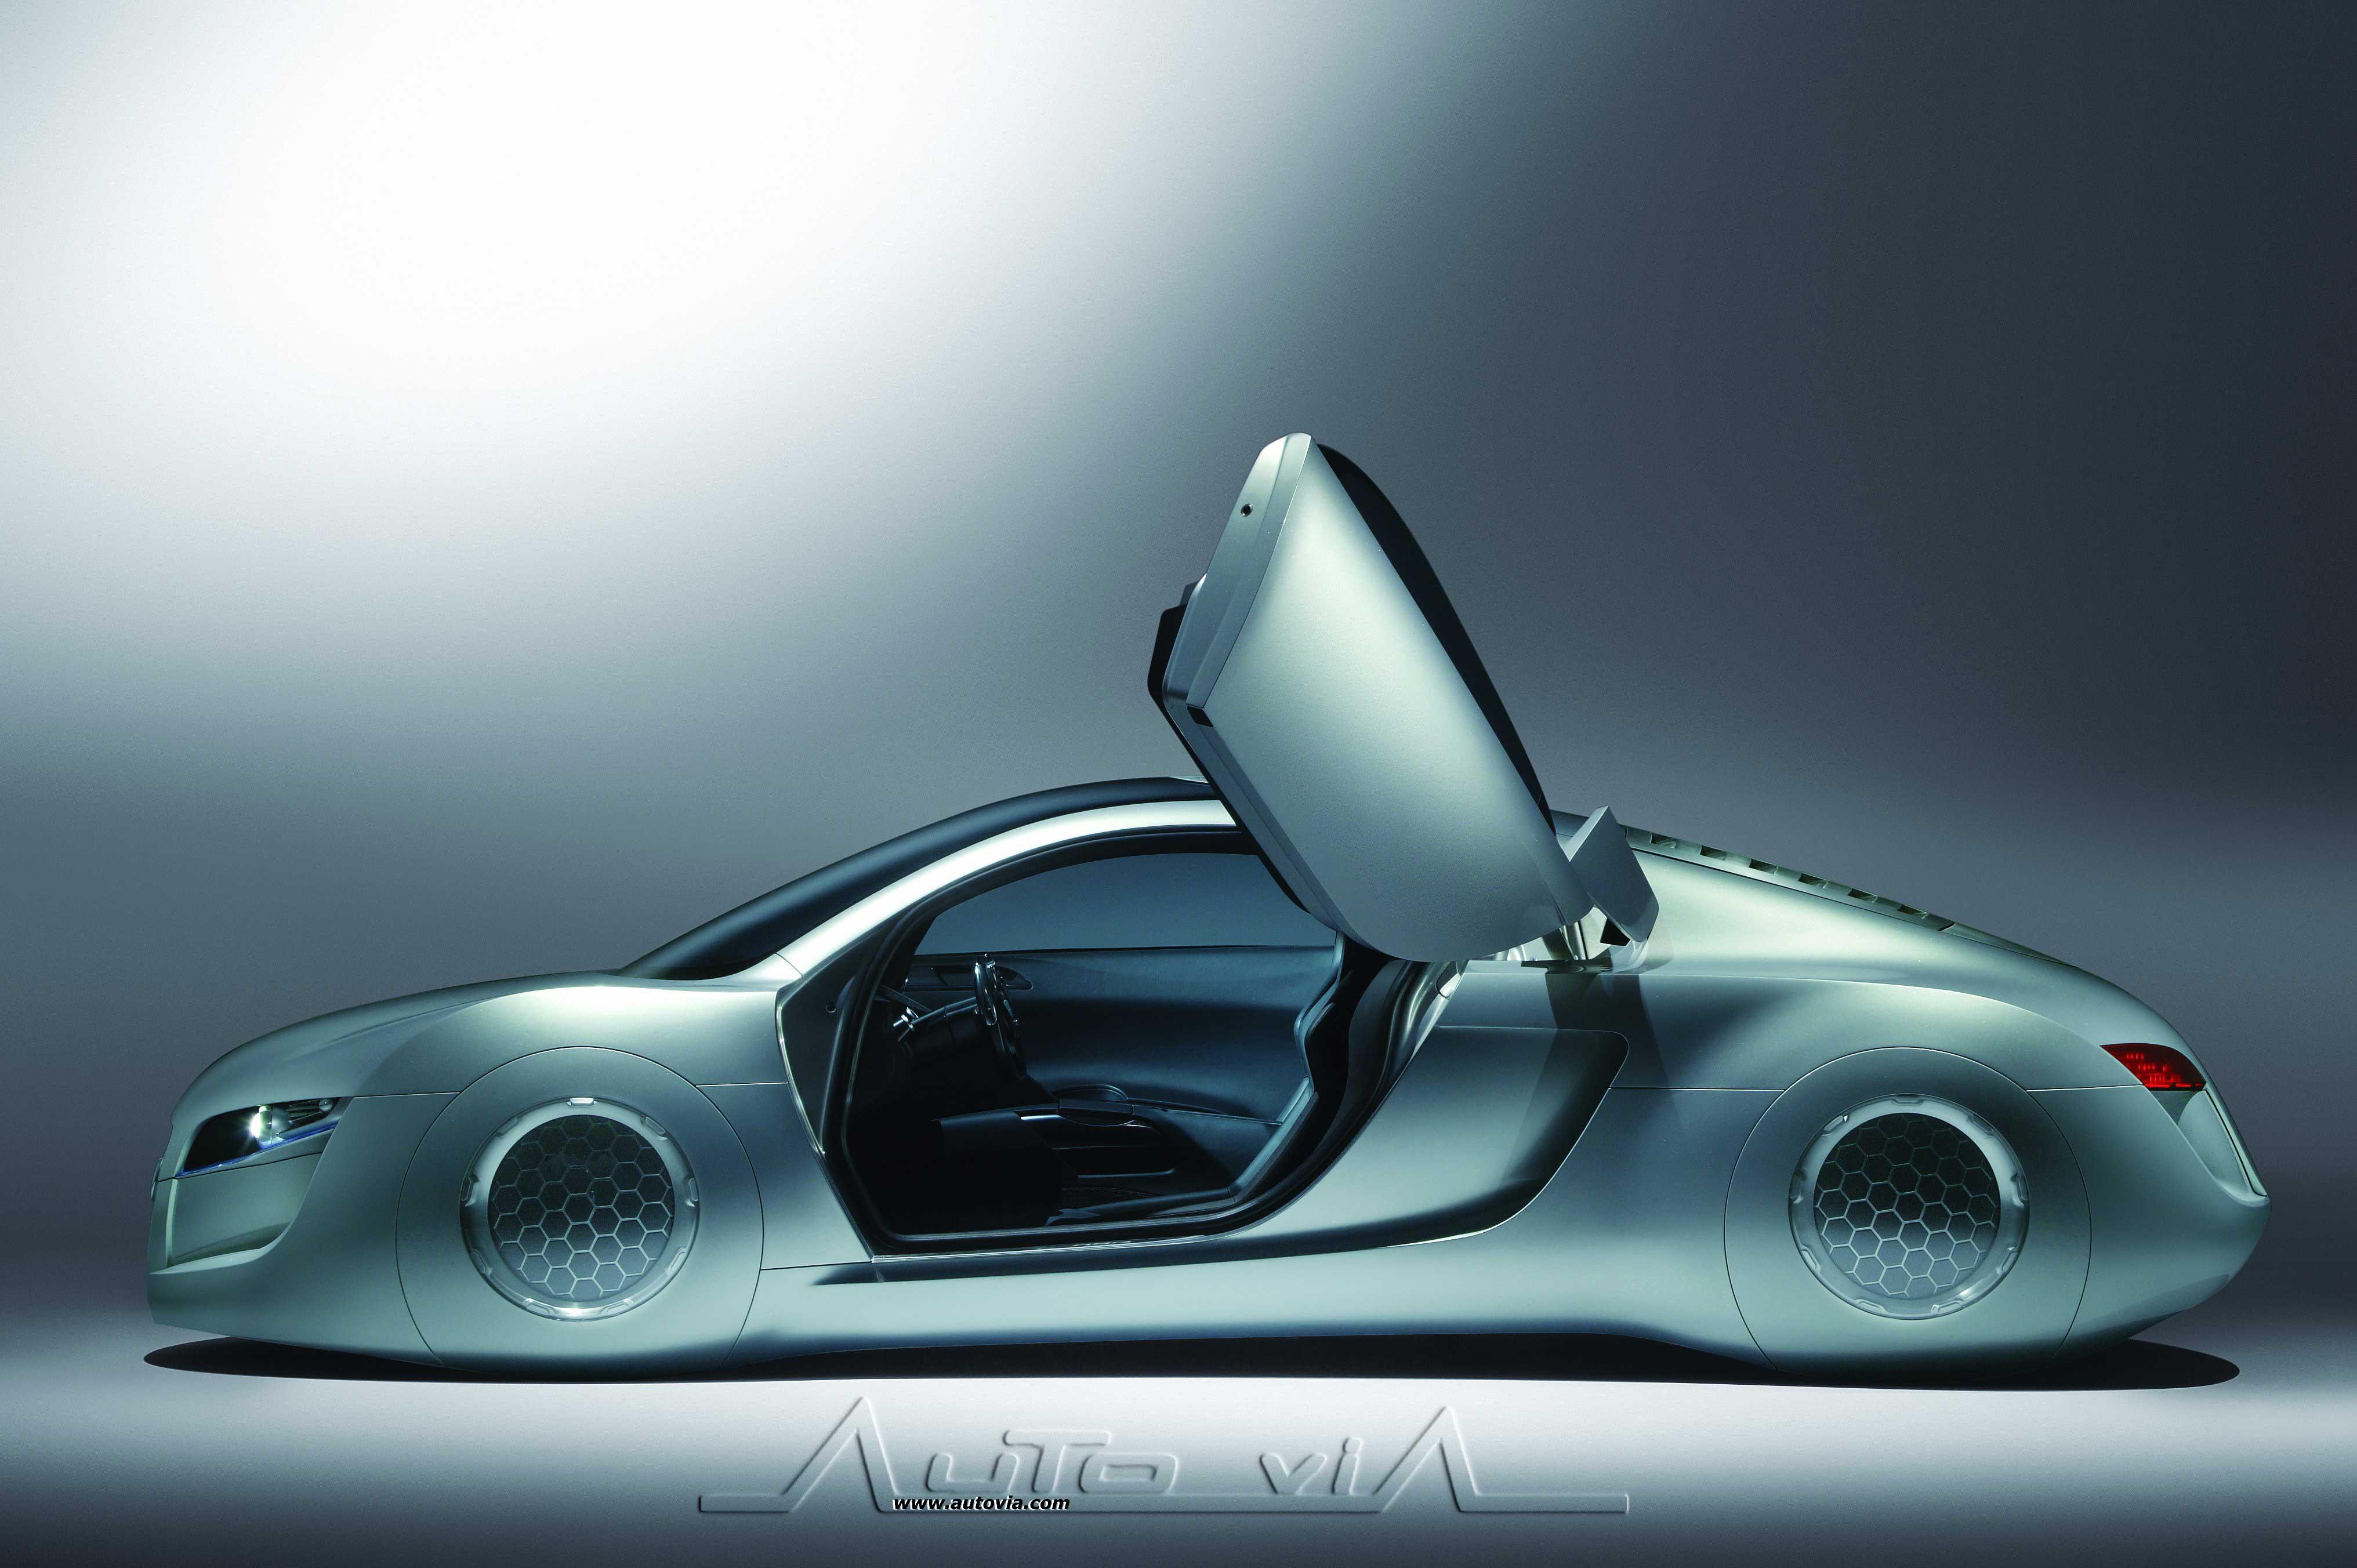 Audi Rsq 5